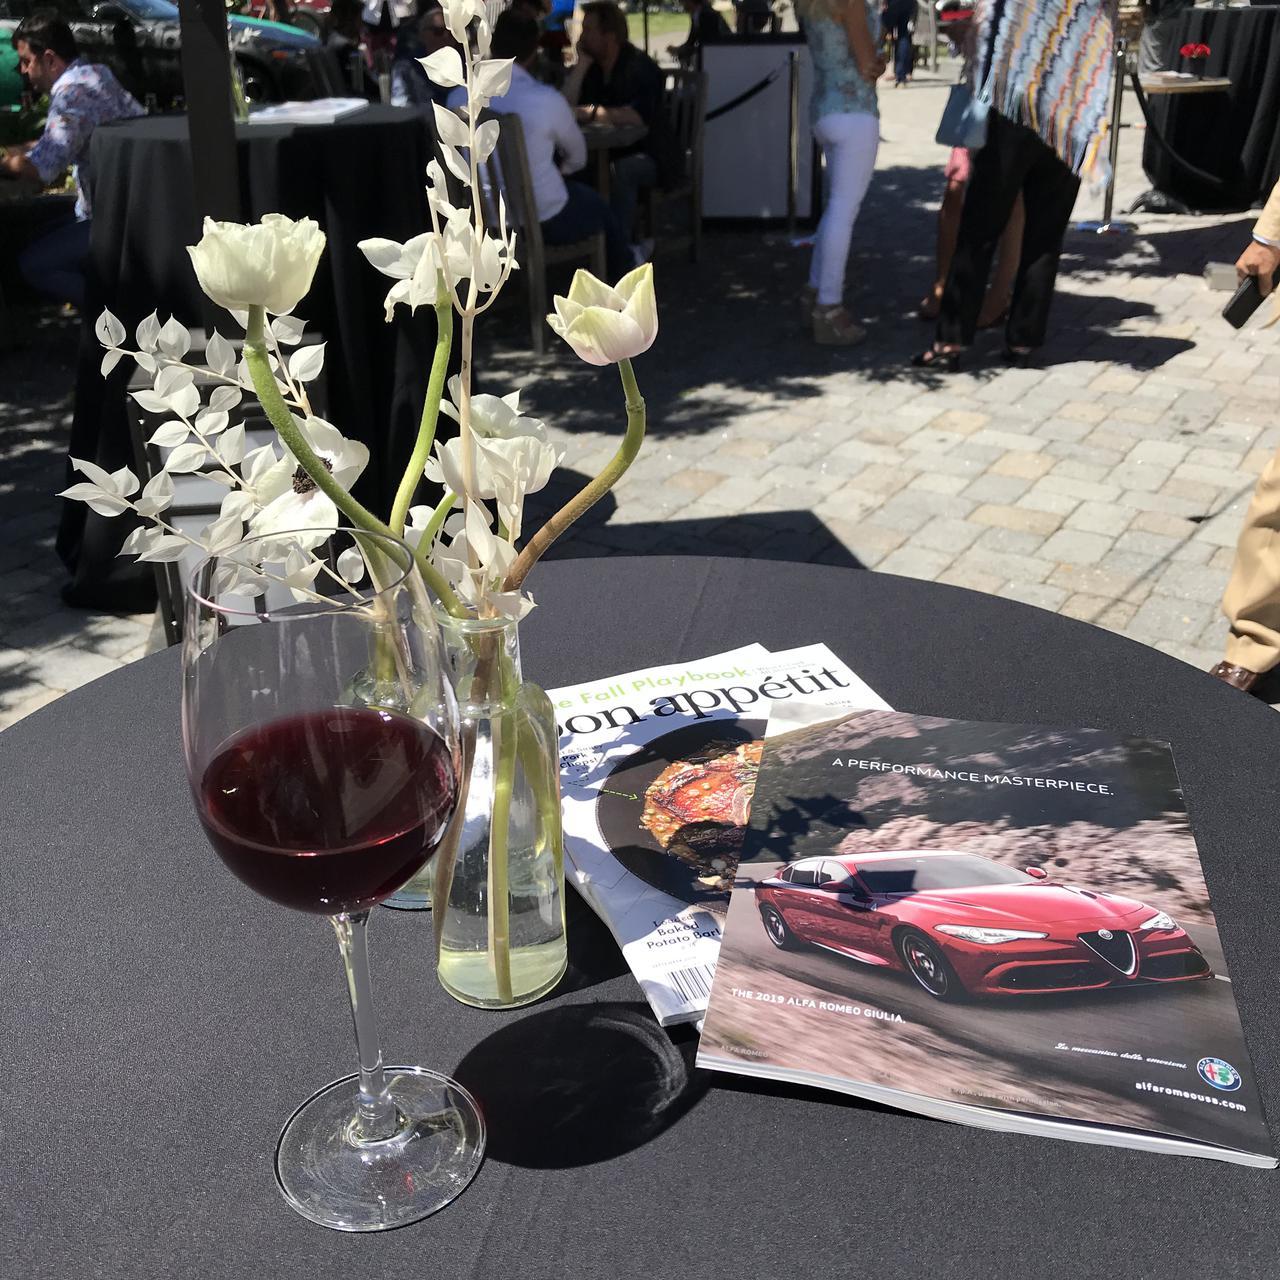 bon appetite magazine - alfa romeo lunch copy 3.jpeg